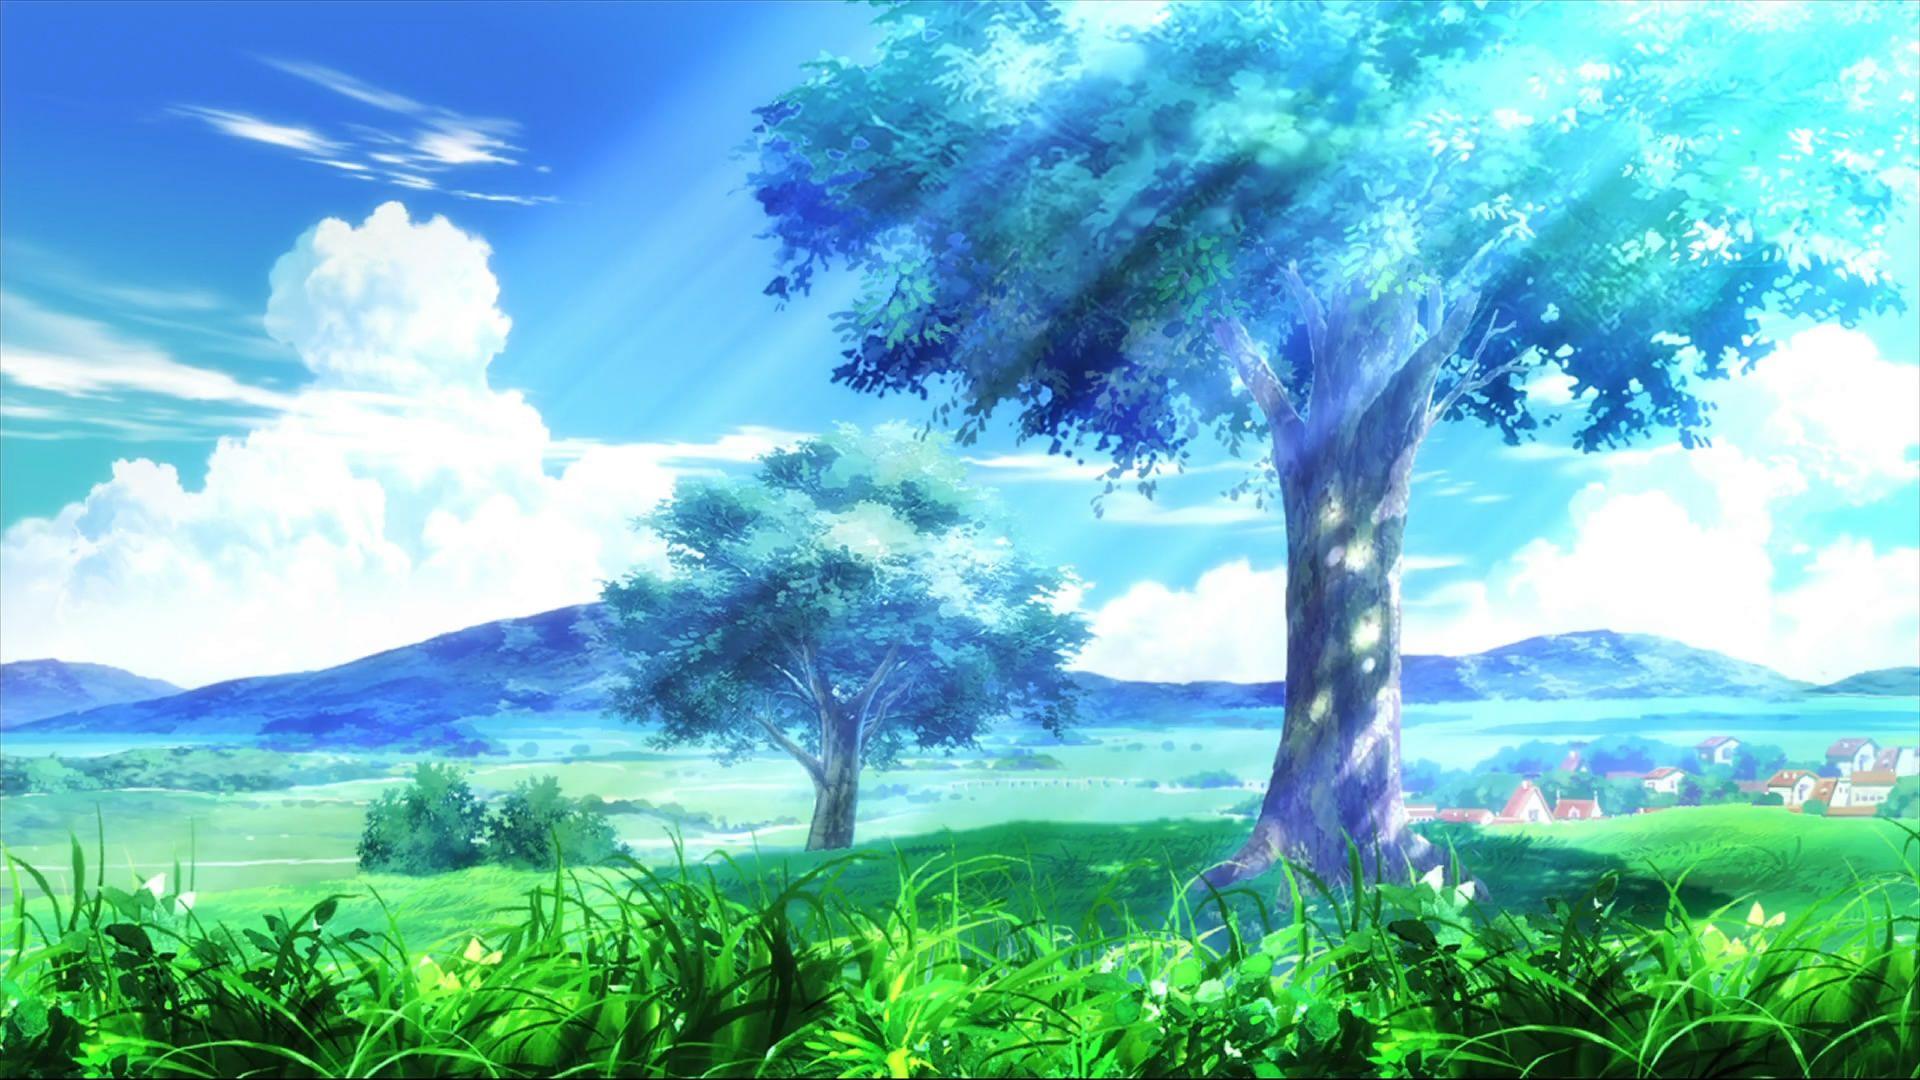 Anime Scenery Desktop Background Anime